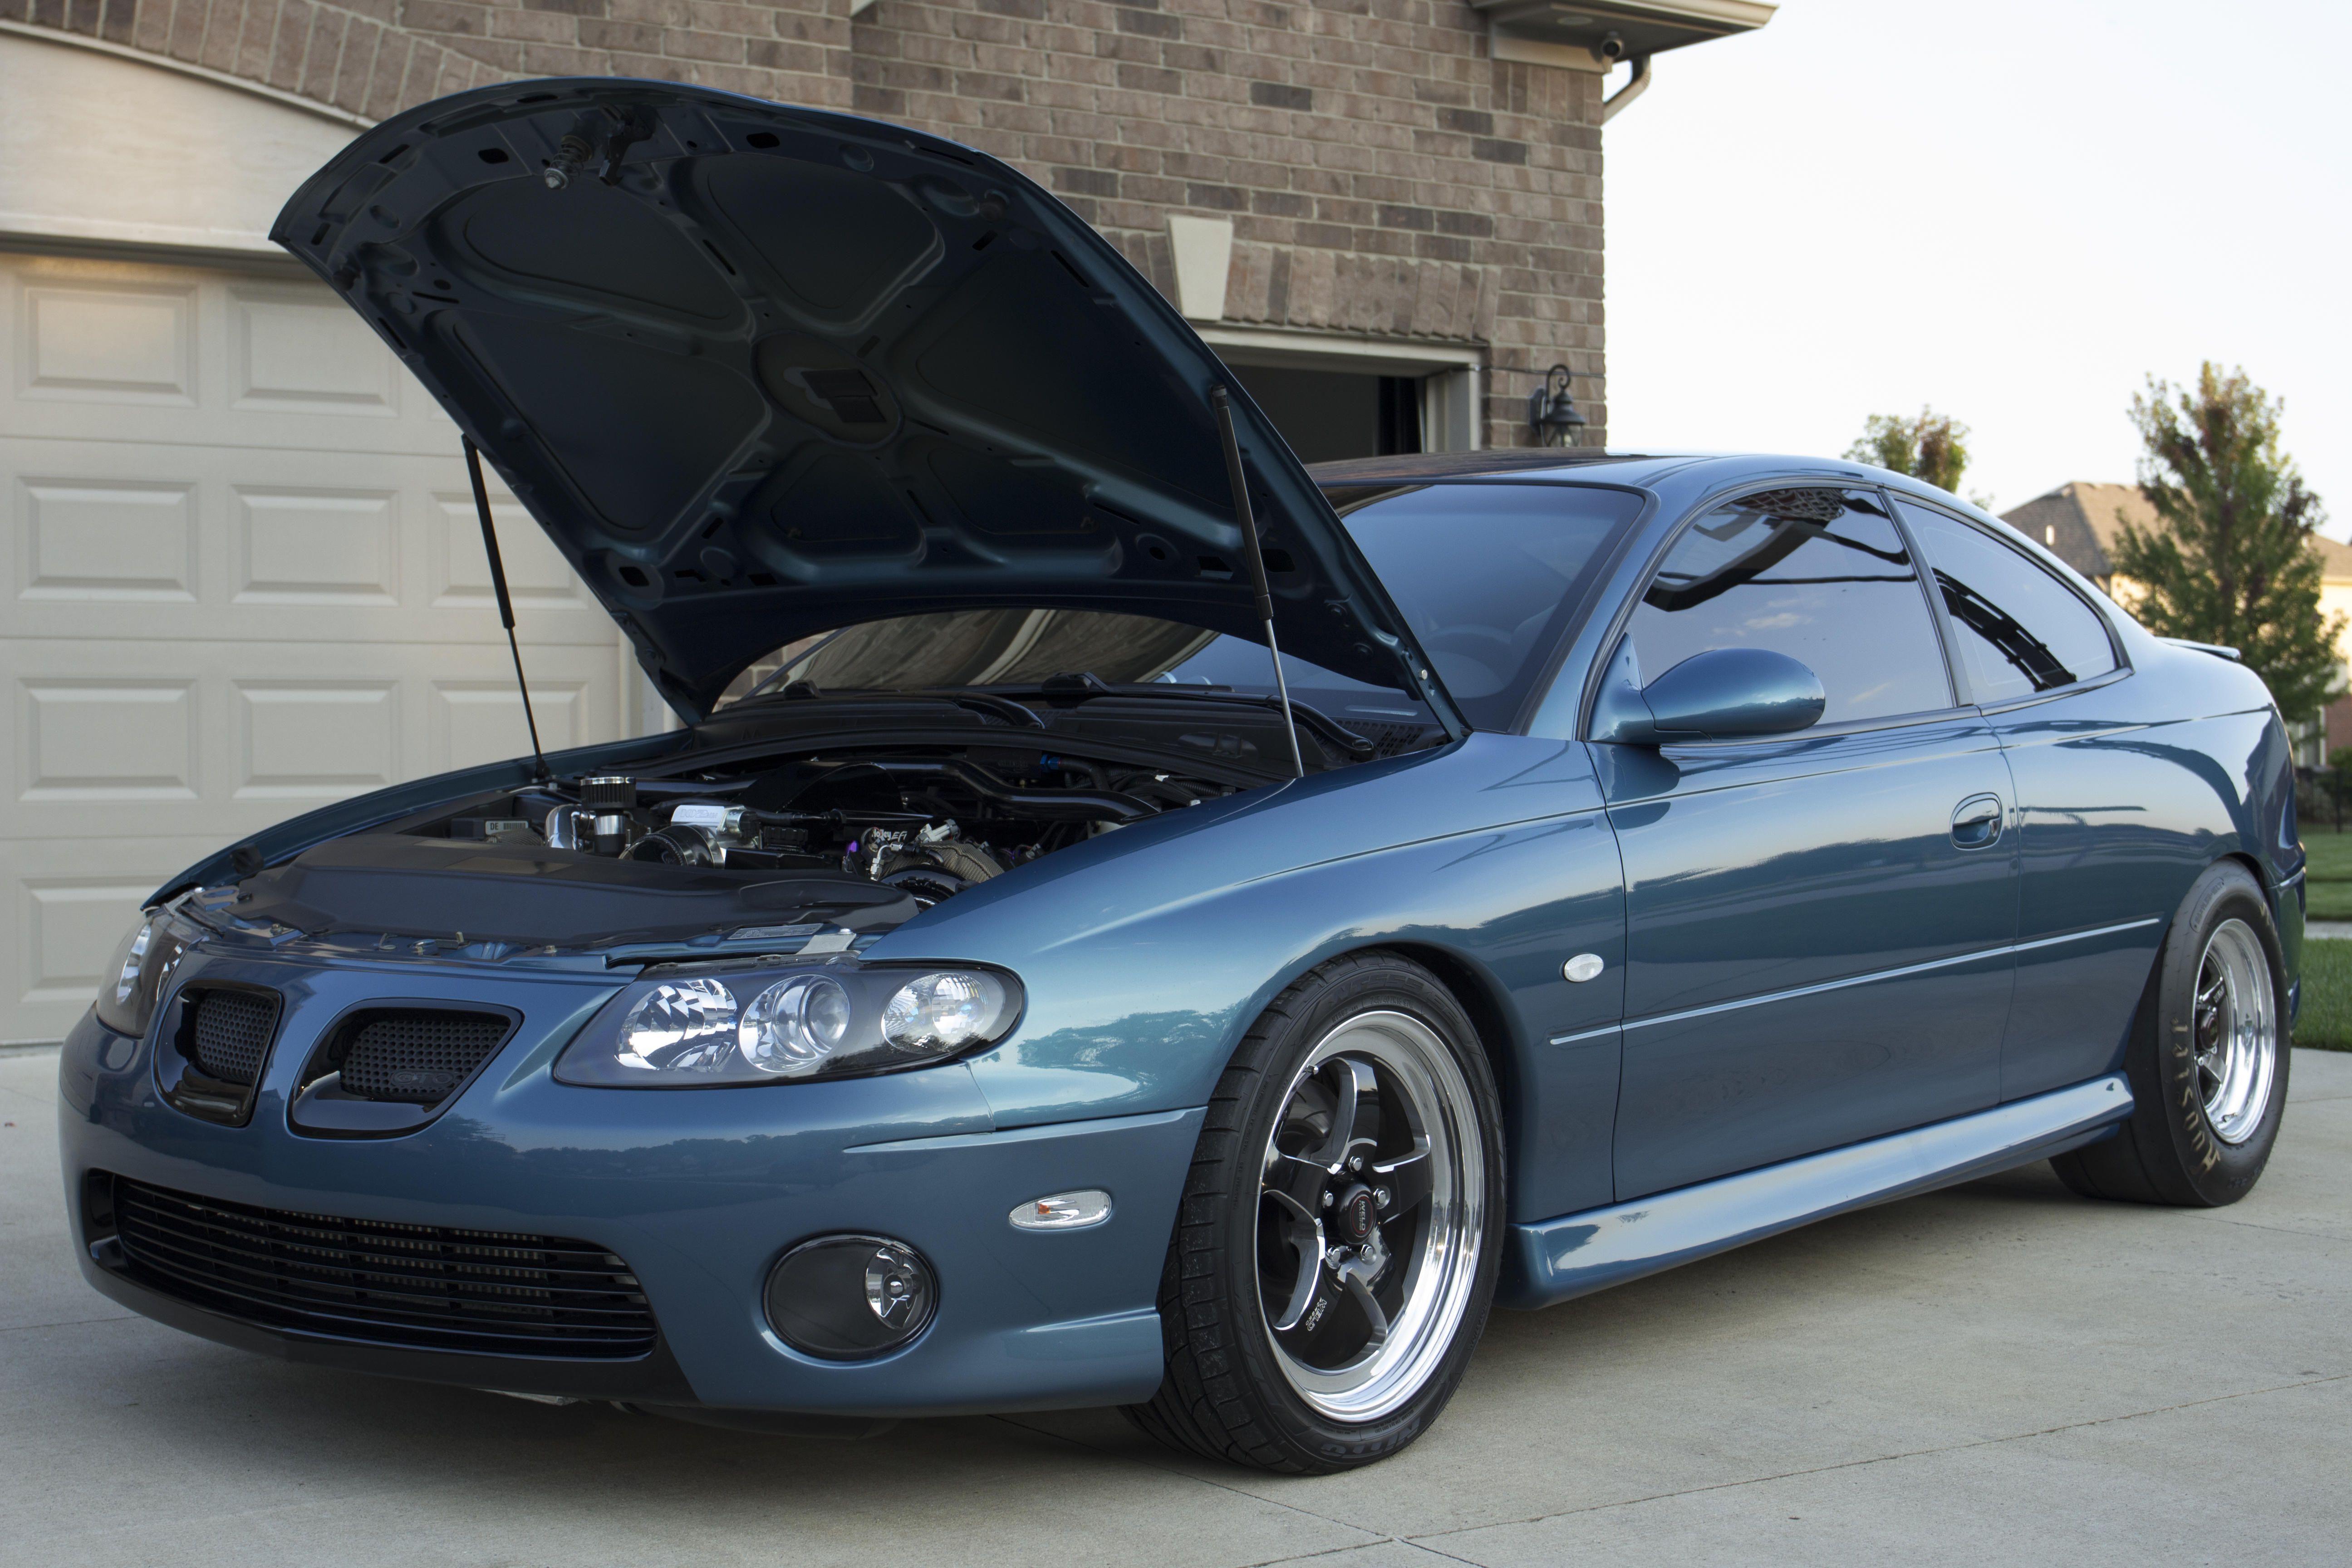 2004 Pontiac Gto Twin Turbo Lsx 4l80 Mini Tubbed 1000rwhp